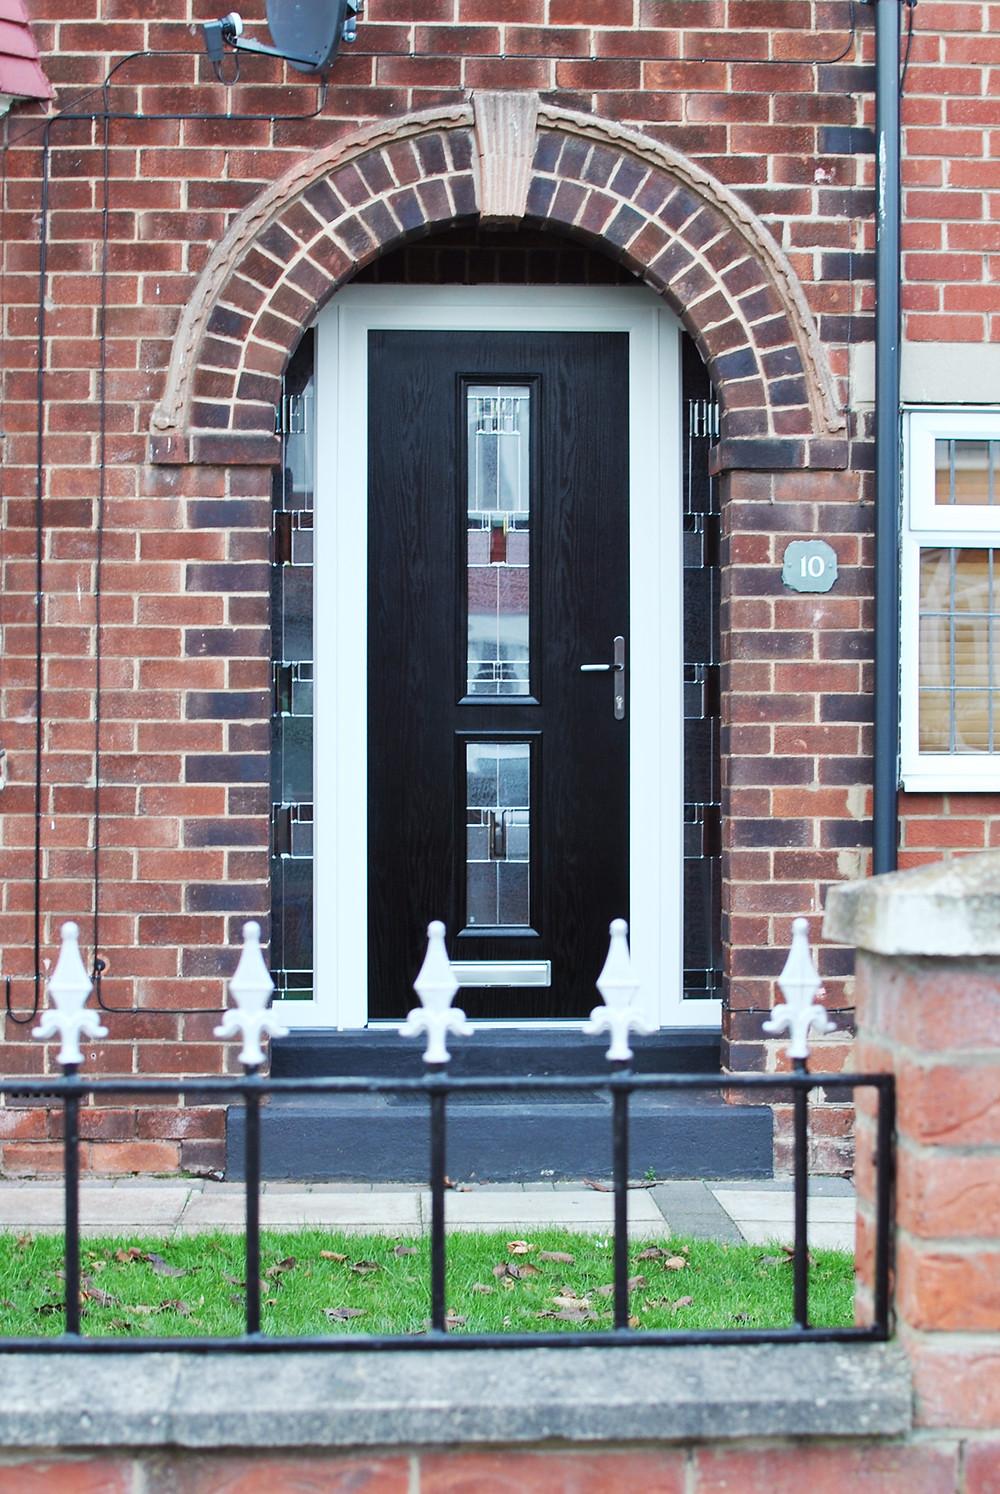 Modern Contemporary Composite Door - Classy Composite Door Installation - Marton Windows